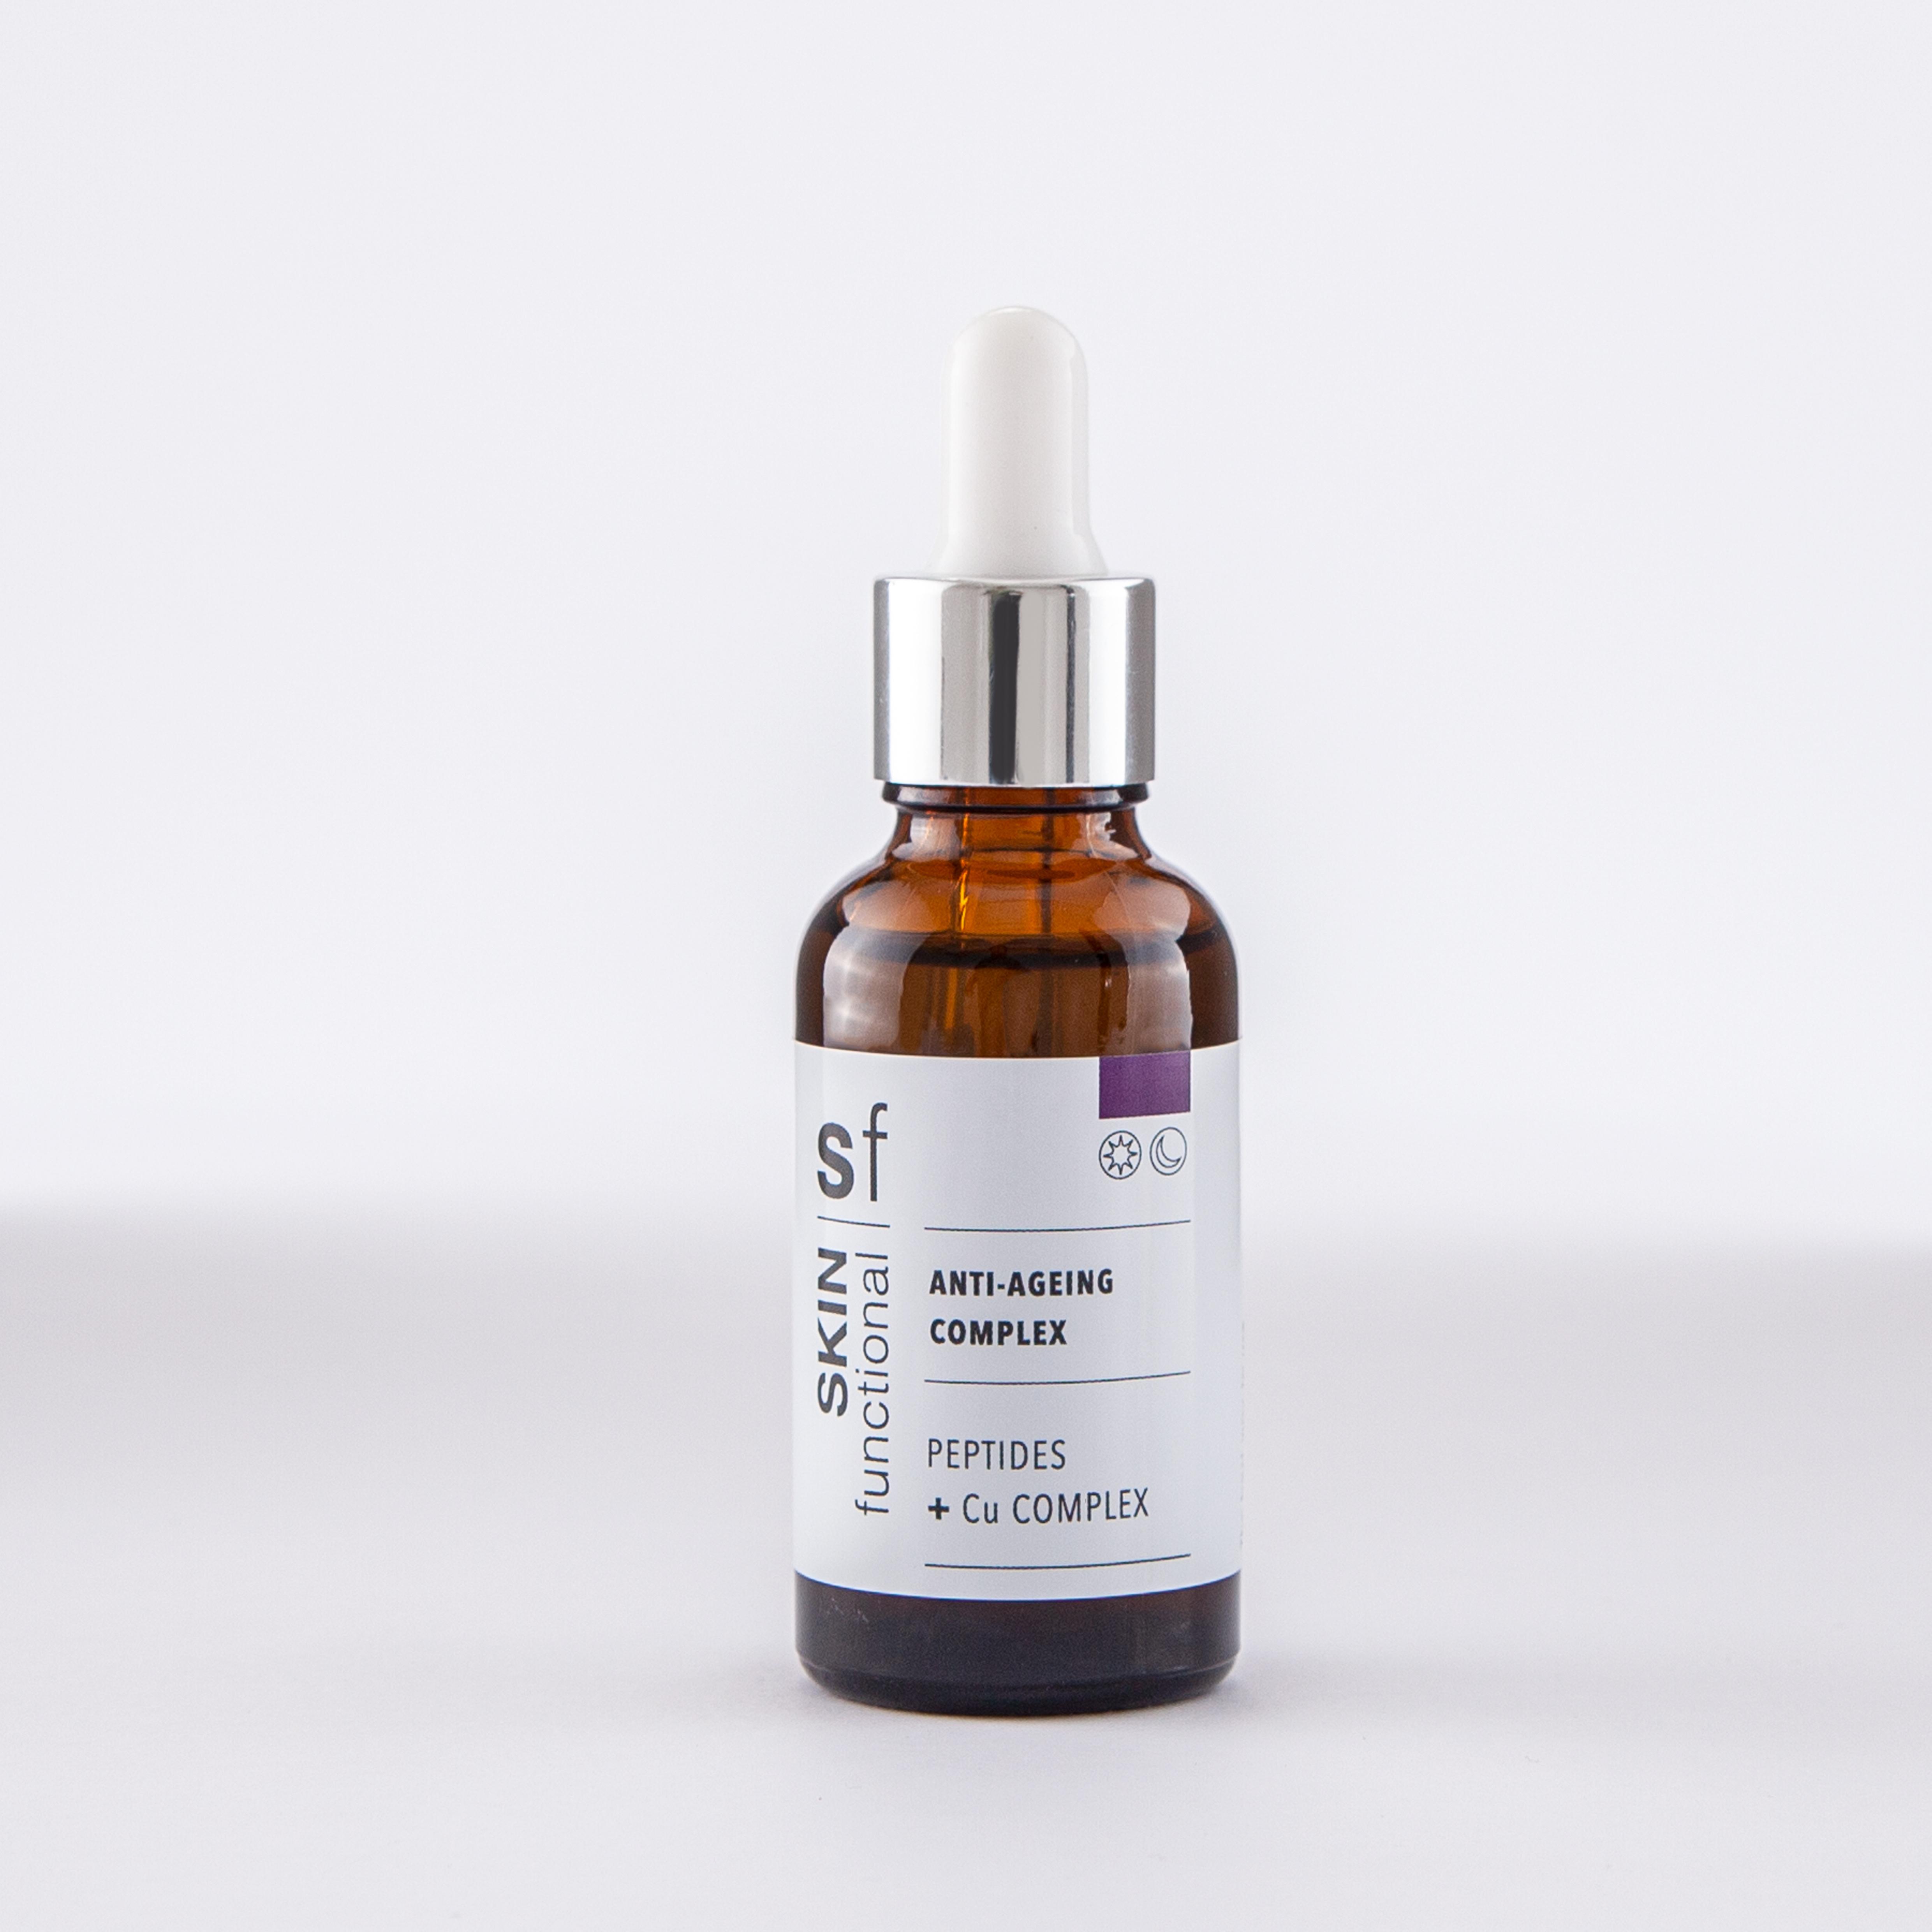 Skin Functional Anti Ageing Complex Peptides + Cu Complex